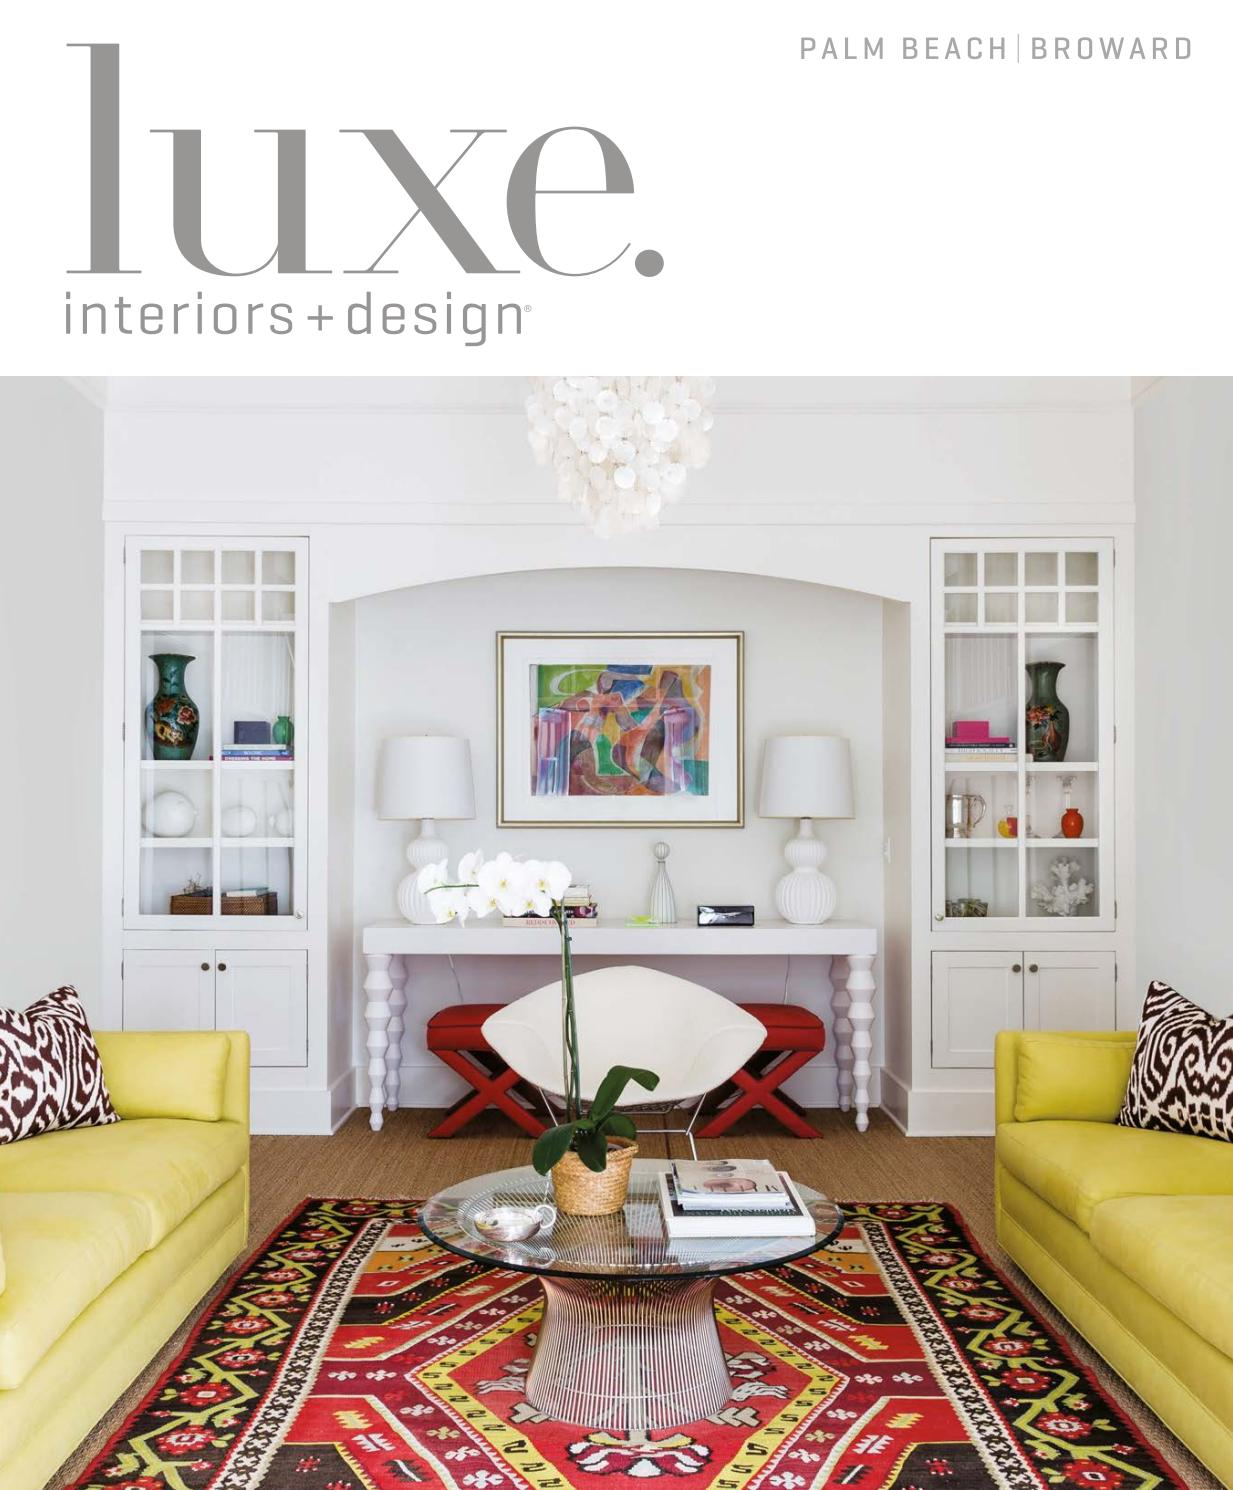 Luxe magazine may 2017 palm beach by sandow issuu - Houston interior design magazine ...